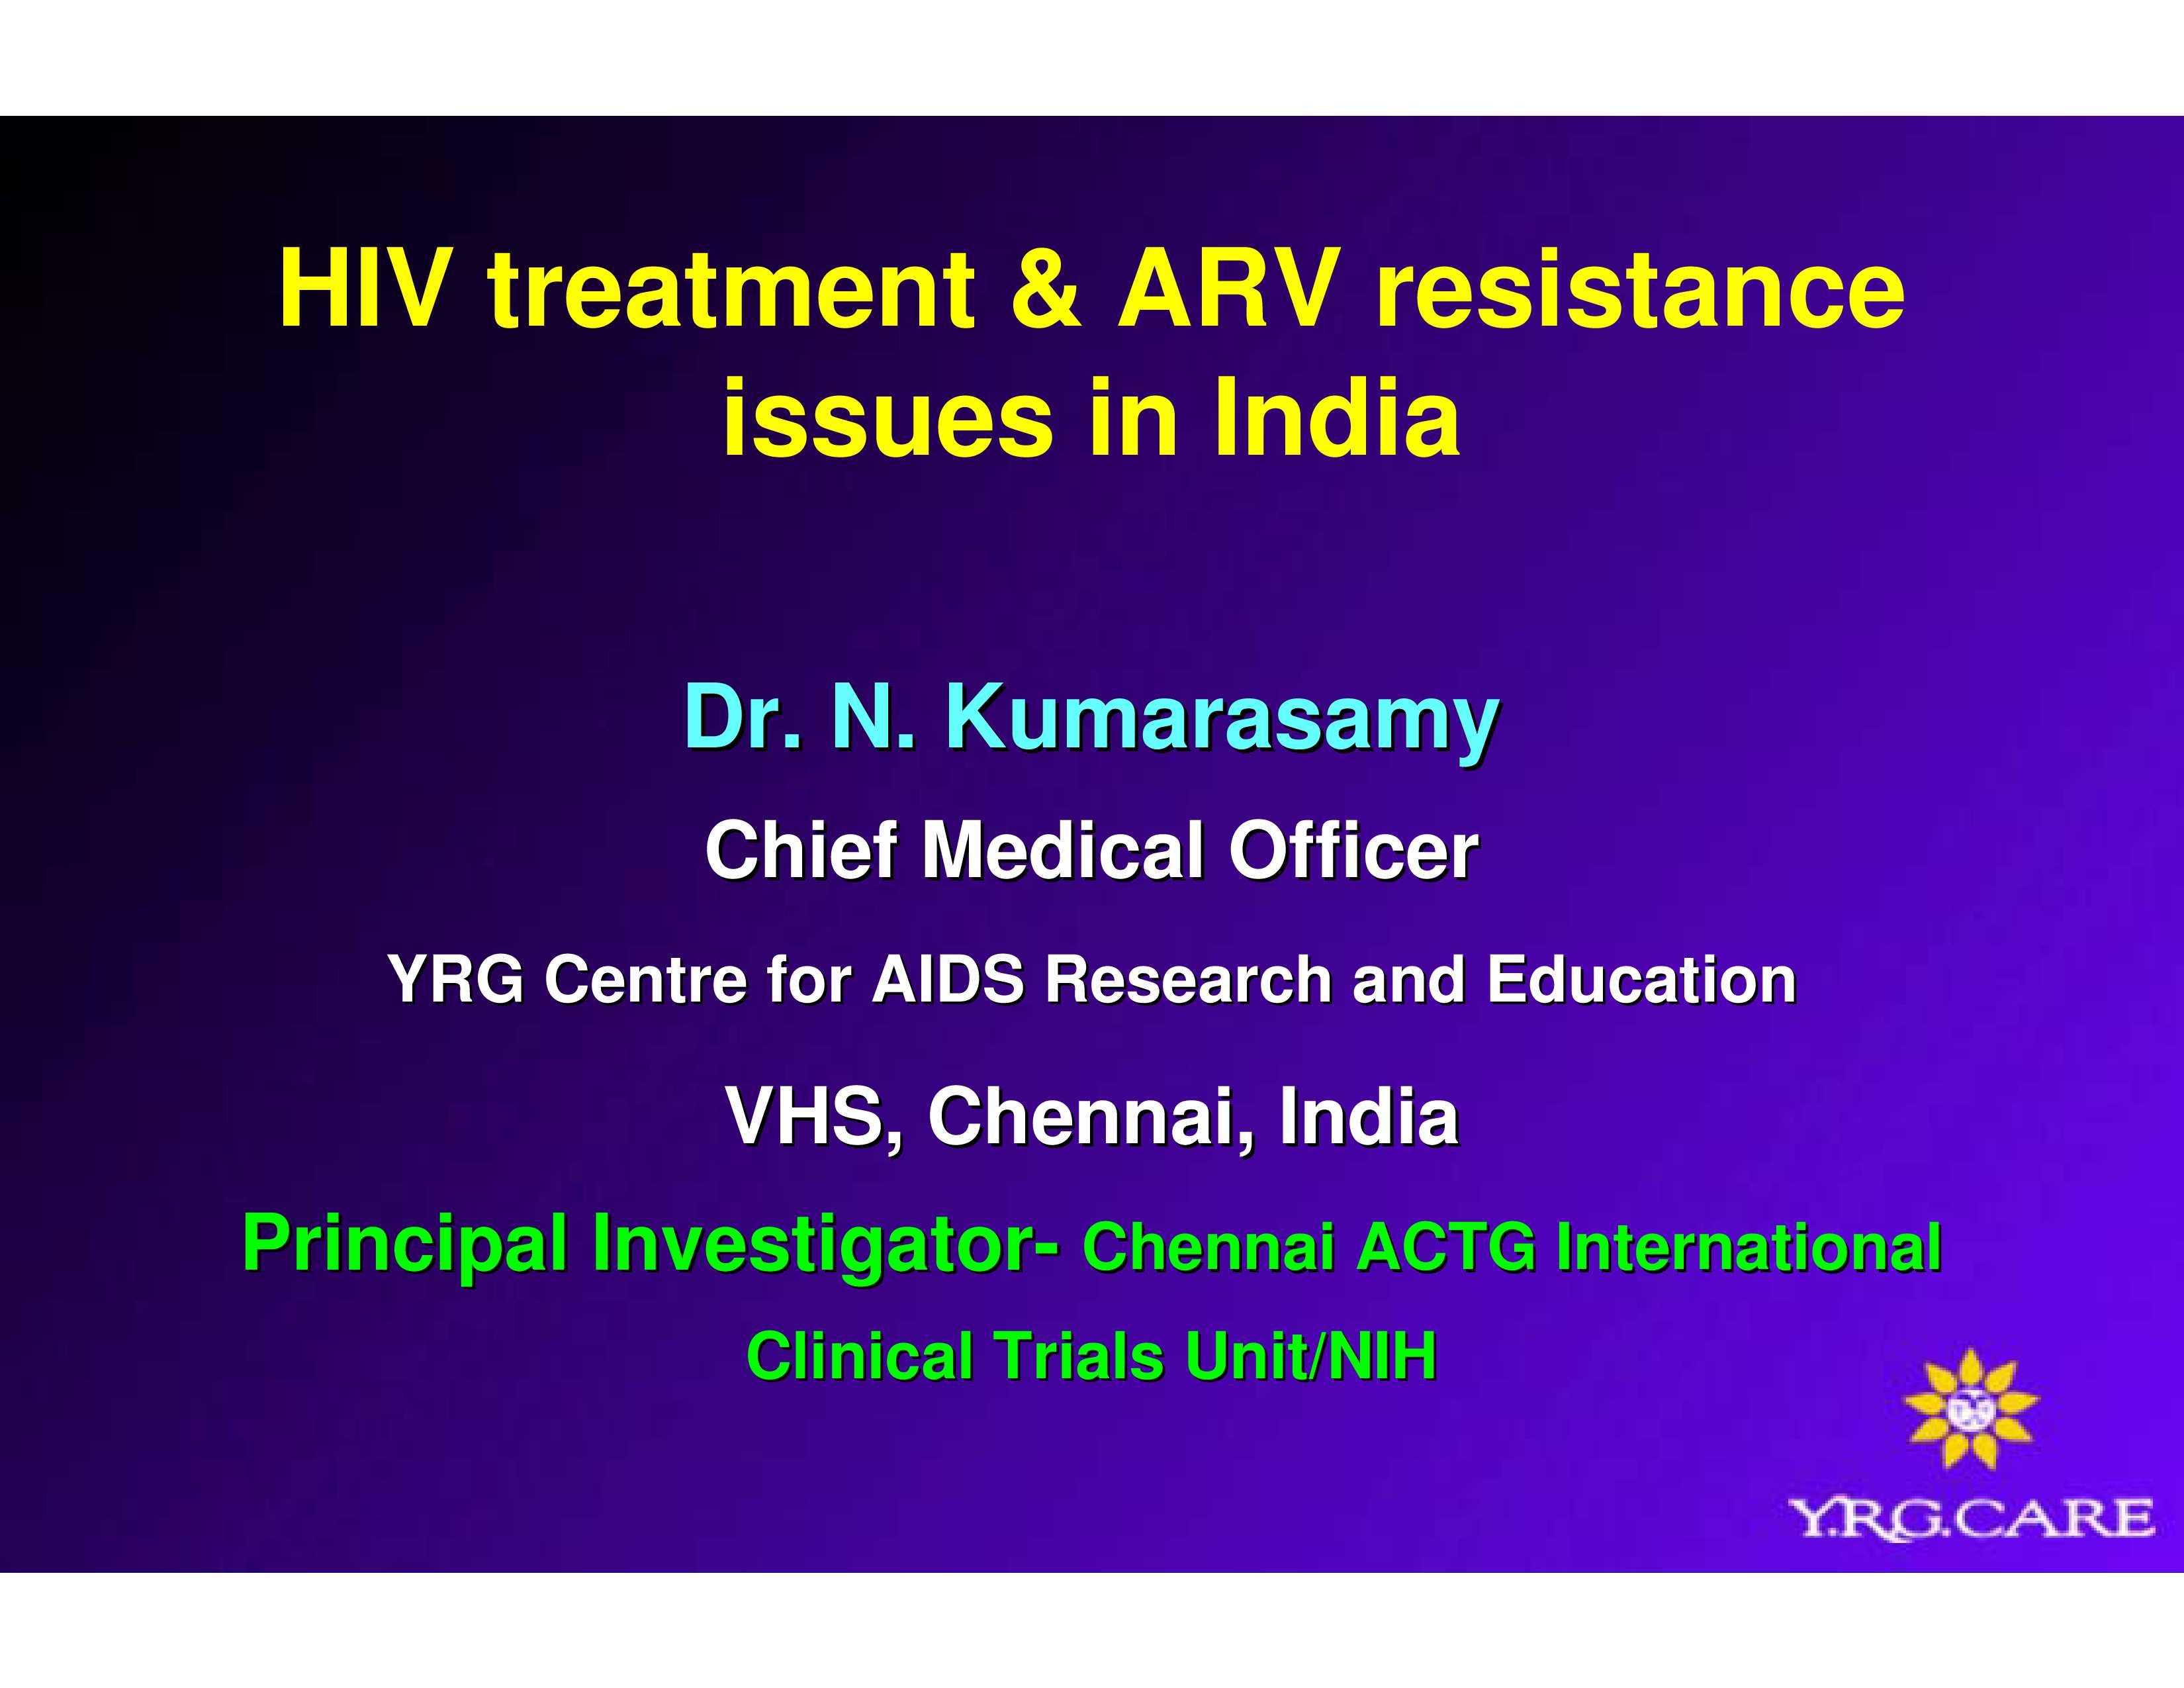 02_Kumarasamy_HIV_treatment_and_resitance_in_India-000001.jpeg